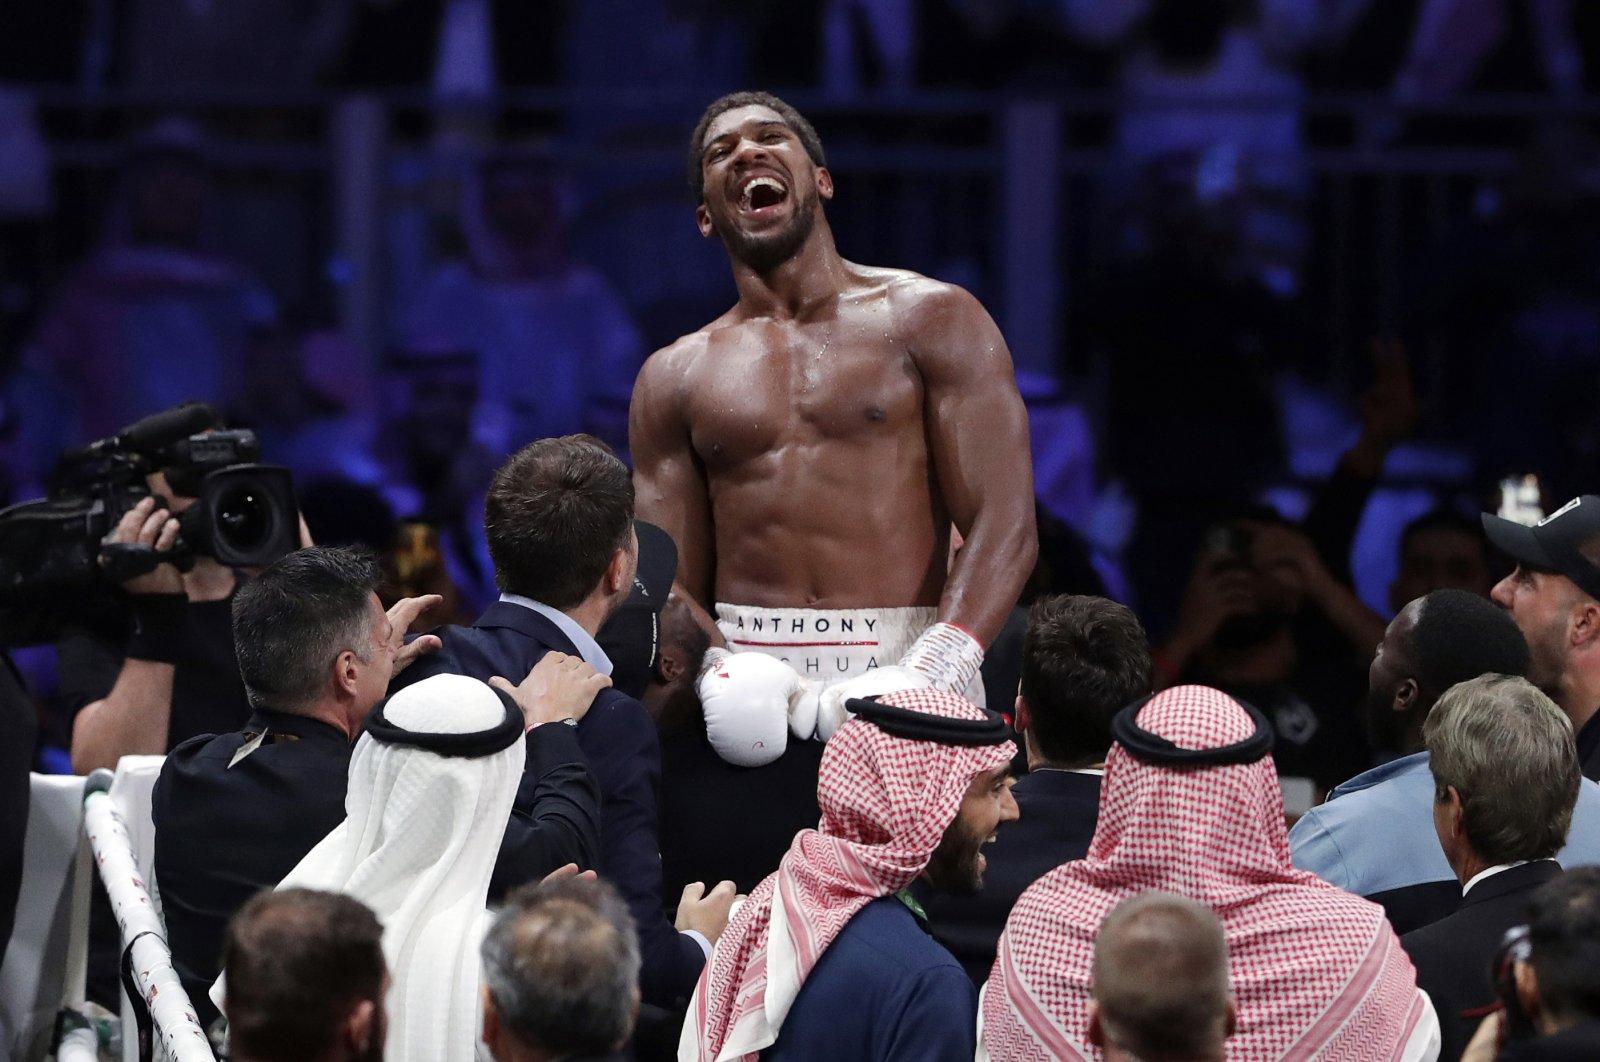 Anthony Joshua celebrates after beating Andy Ruiz Jr. to win their World Heavyweight Championship contest at the Diriyah Arena, Riyadh, Saudi Arabia, Dec. 8, 2020. (AP Photo)